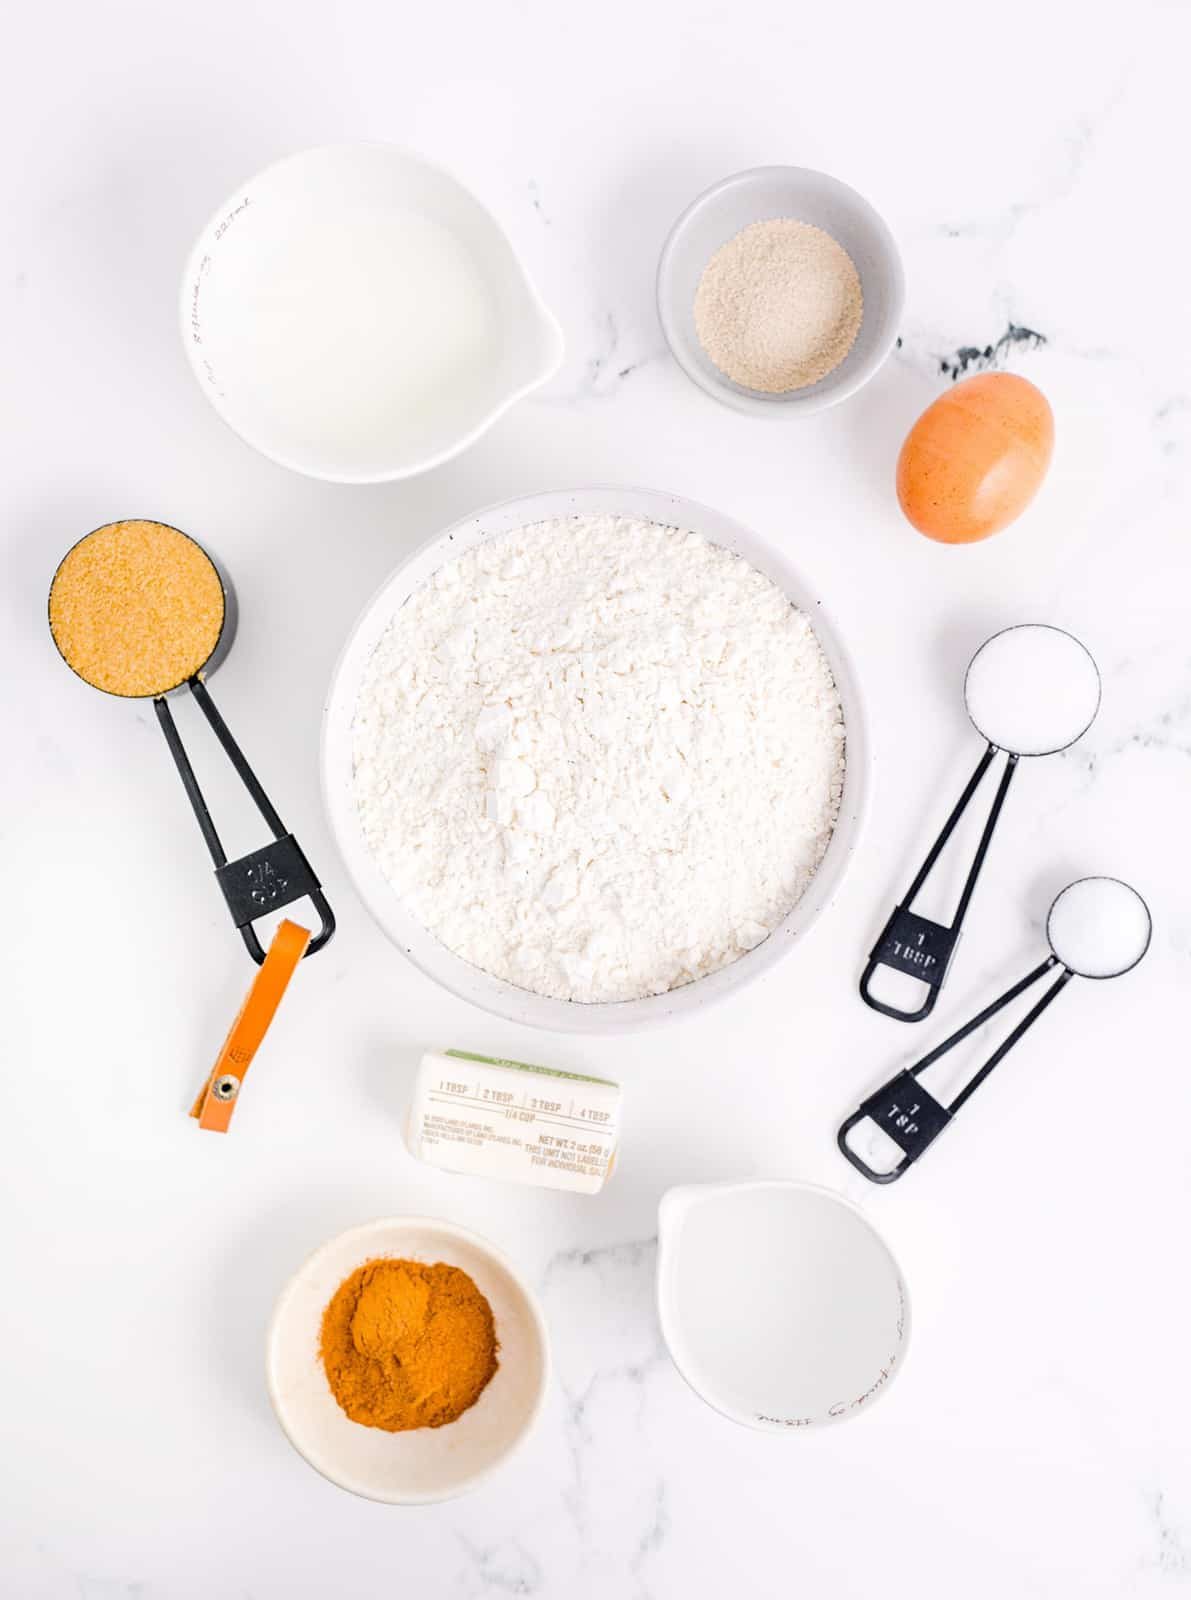 Ingredients needed to Make Cinnamon Swirl Bread